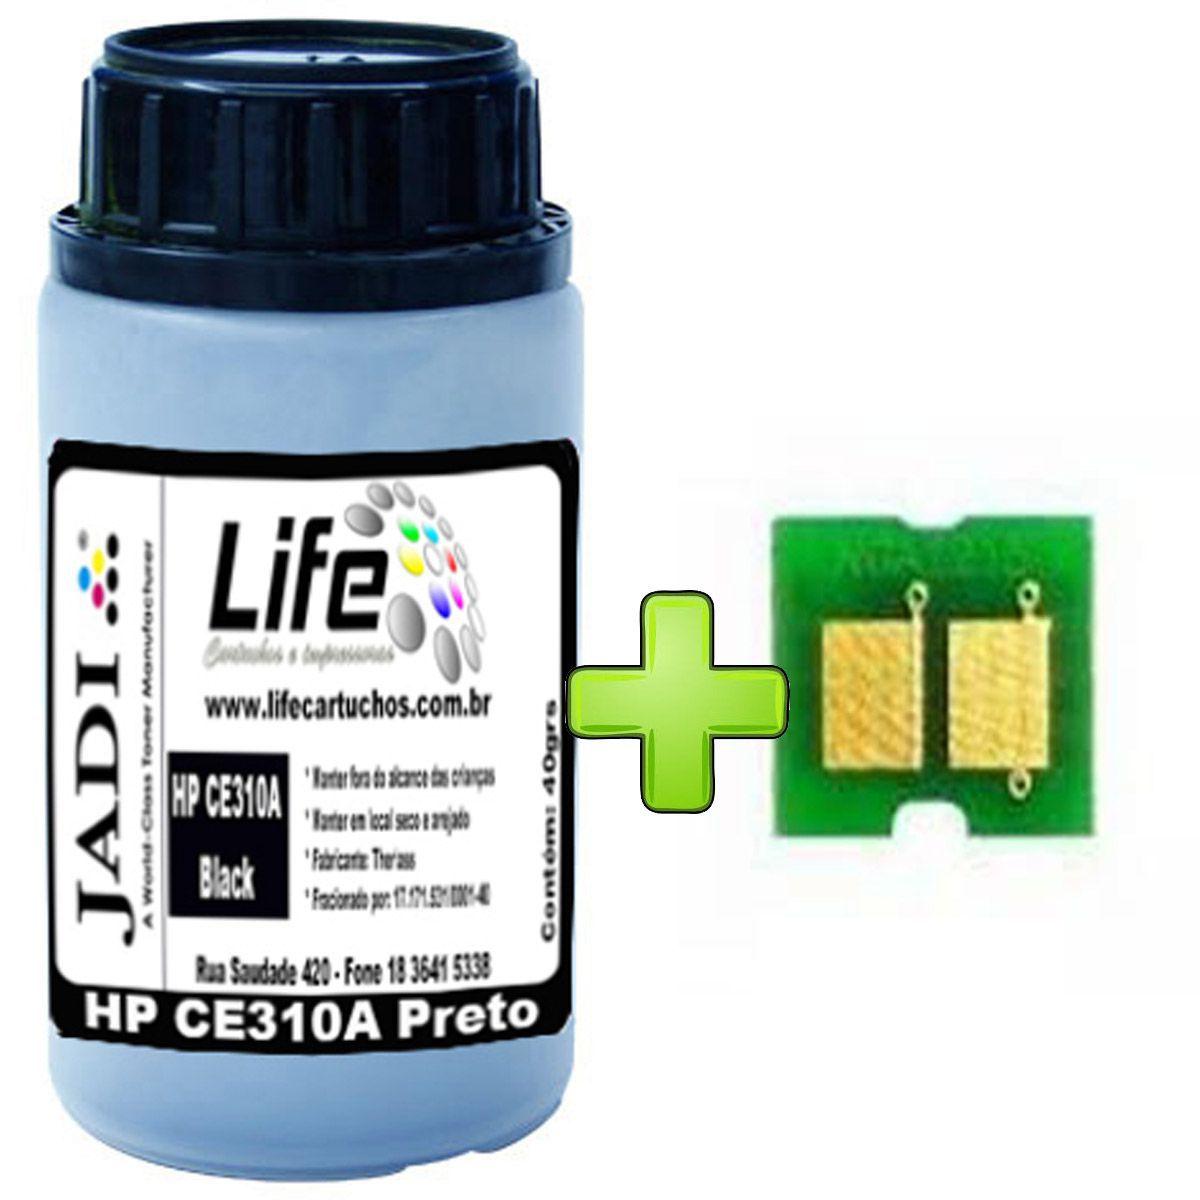 Refil Pó Toner 40G + Chip HP CE310A 310 126A - Jadi - Preto - CP1025 M175A